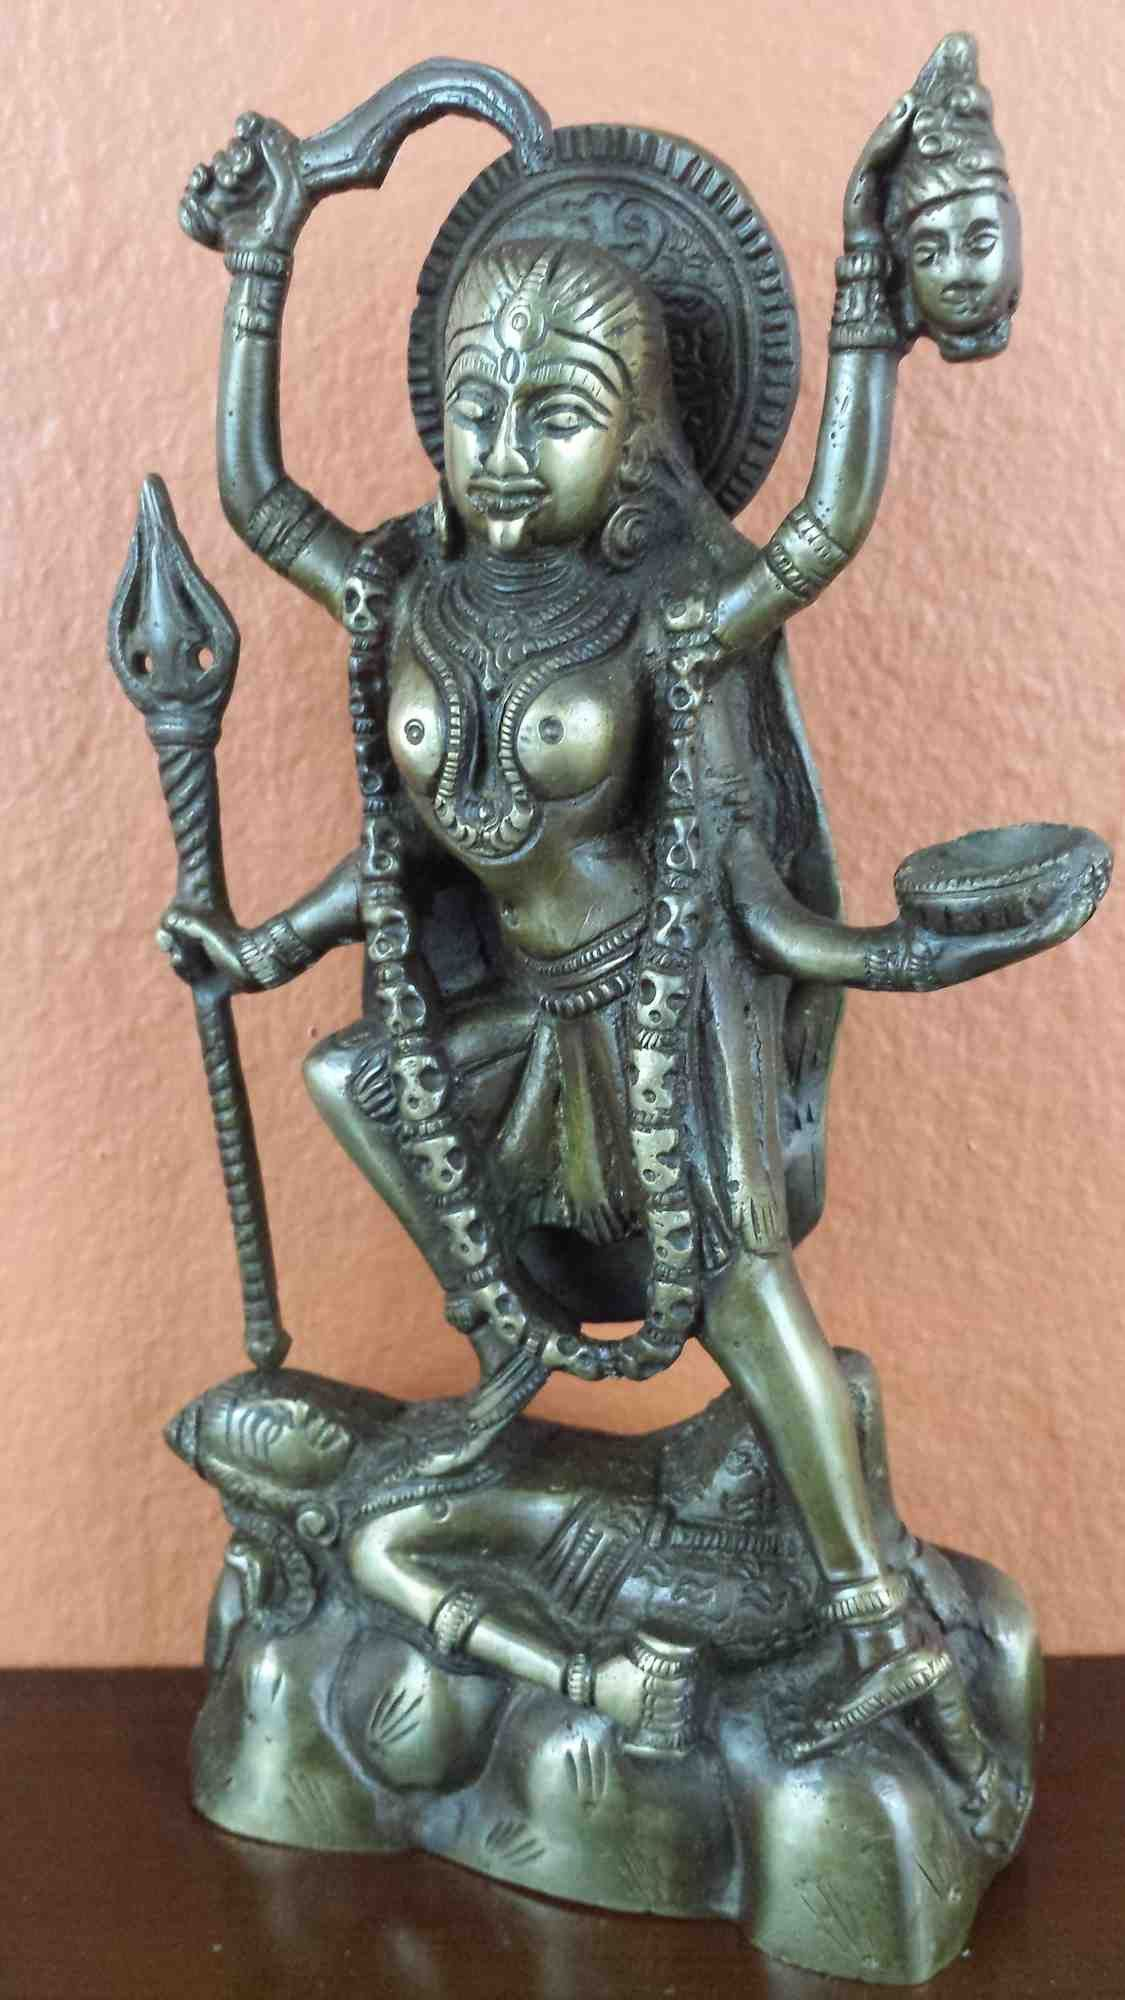 Hindu Goddess Kali Statue Figurine Sculpture Antique Brass Finish ...